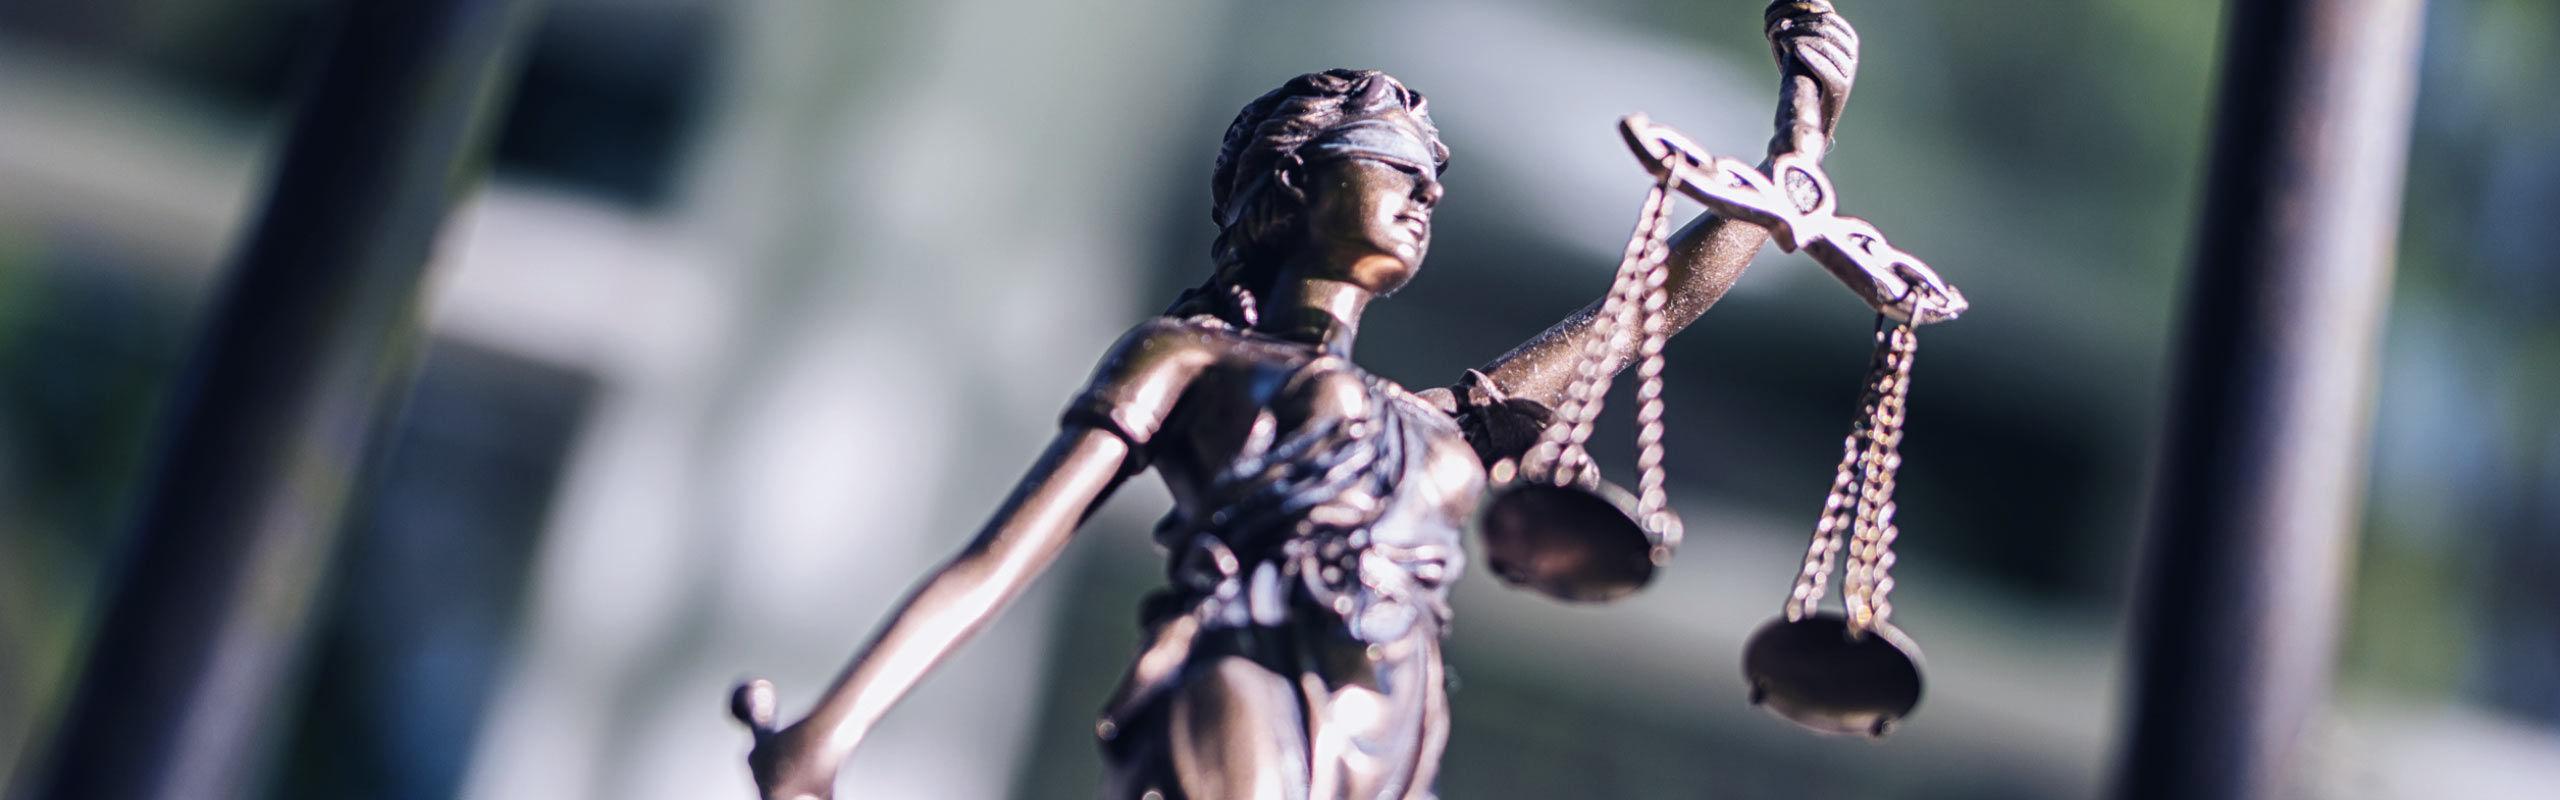 Werbung Anwalt